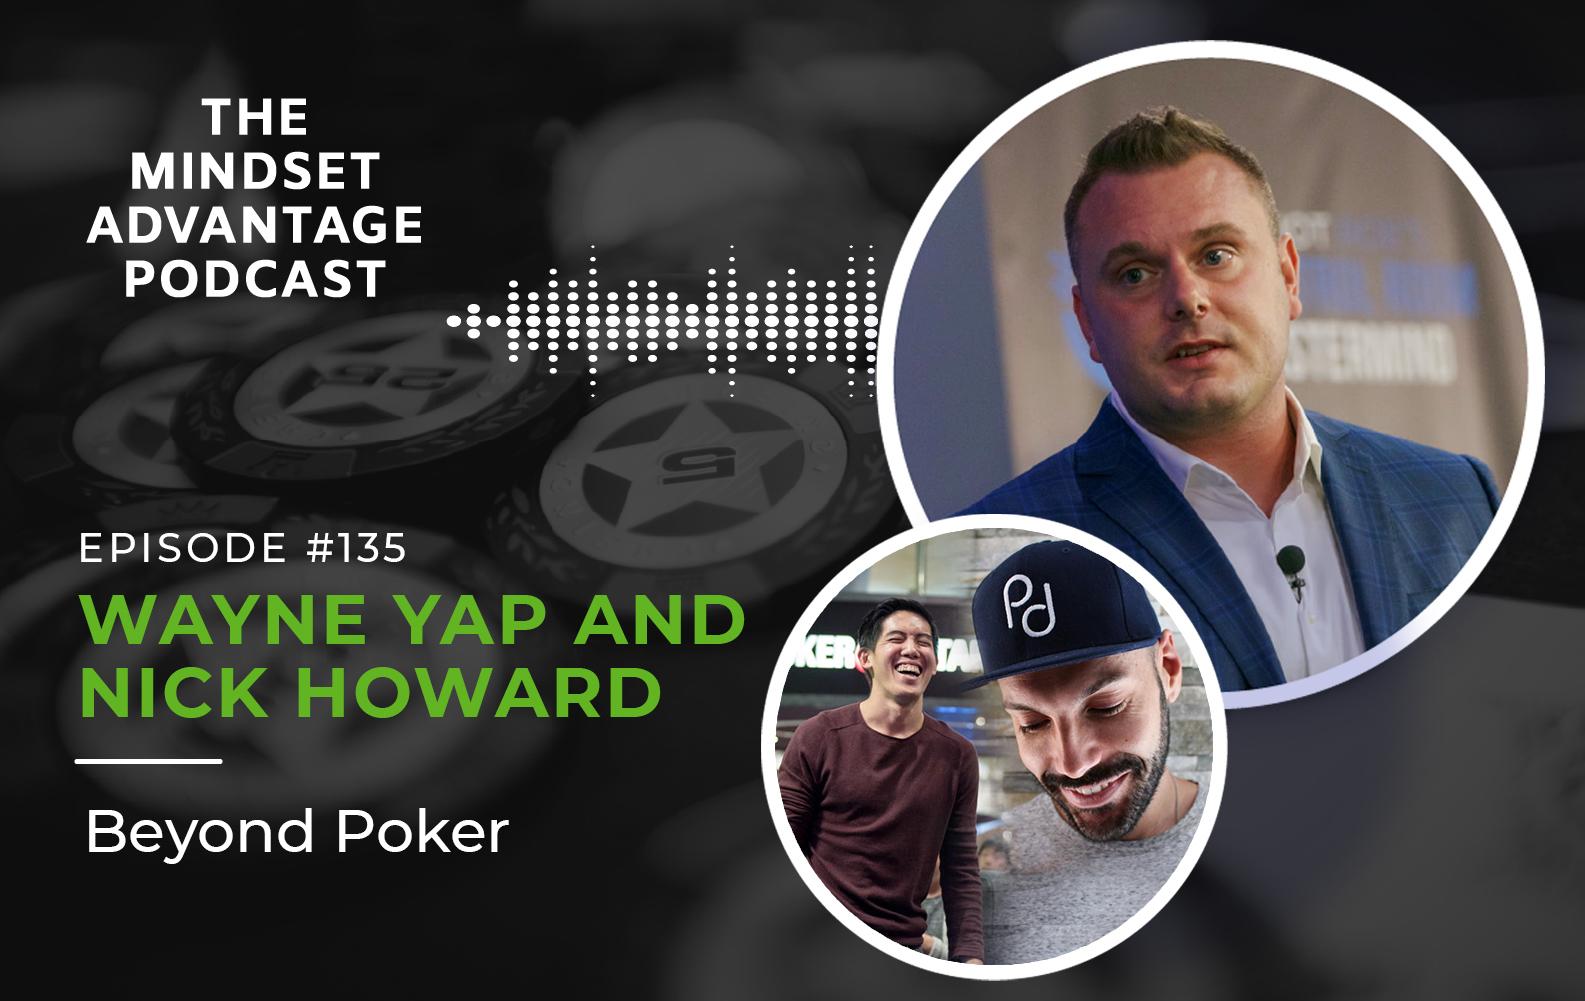 Episode 135 - Wayne Yap and Nick Howard